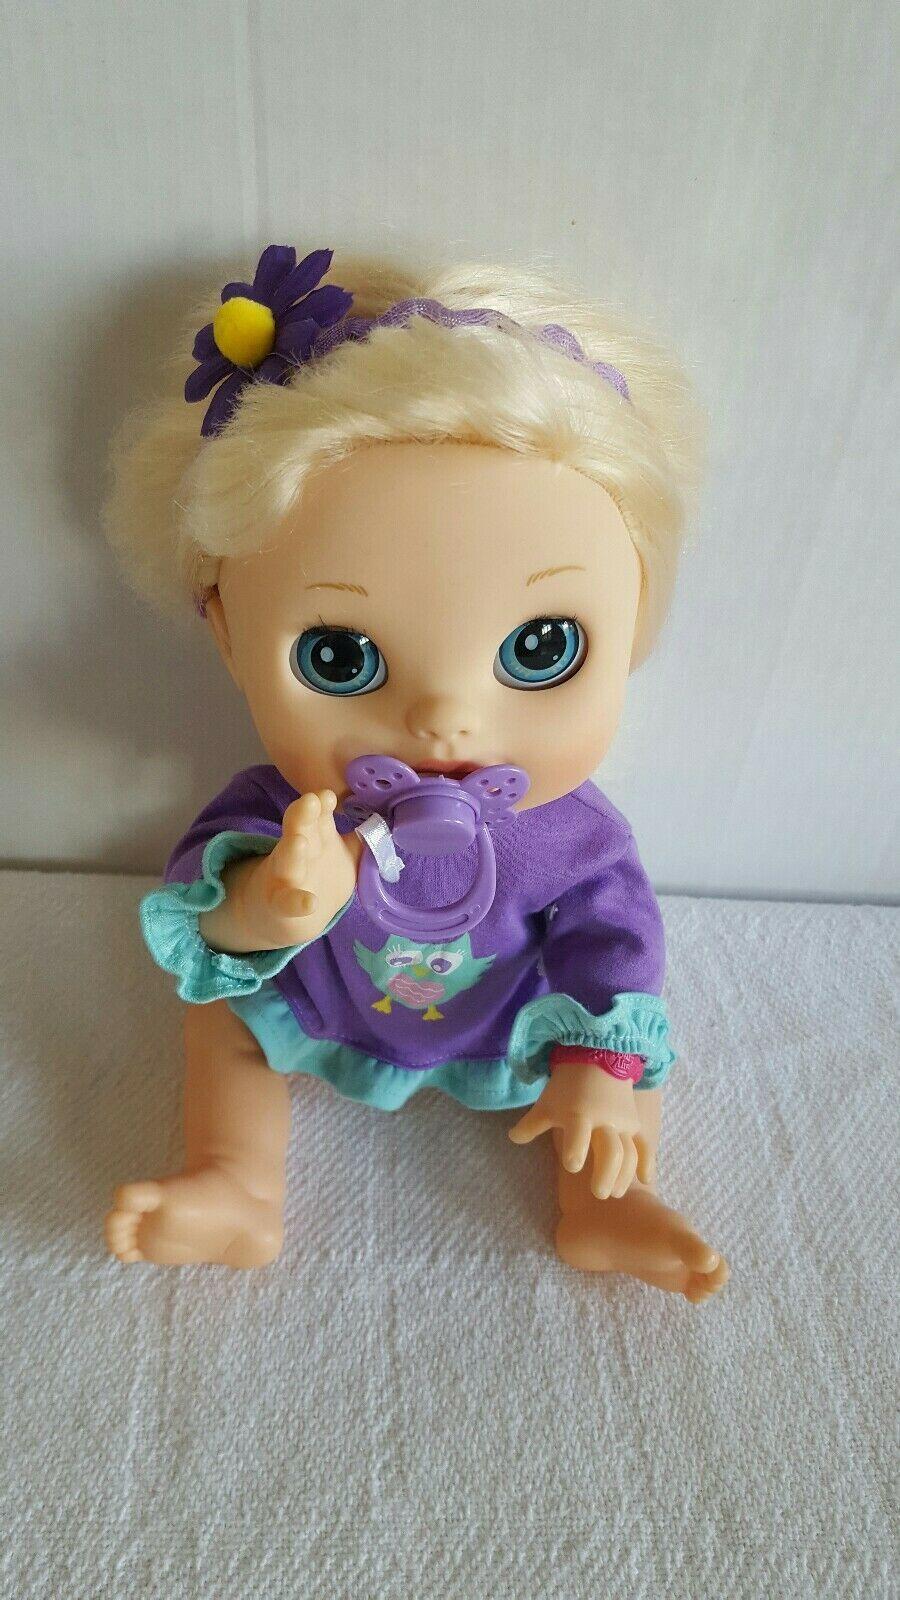 Hasbro Baby Alive 2012 Real Surprises Interactive Bilingual Spa/Eng Talking Doll